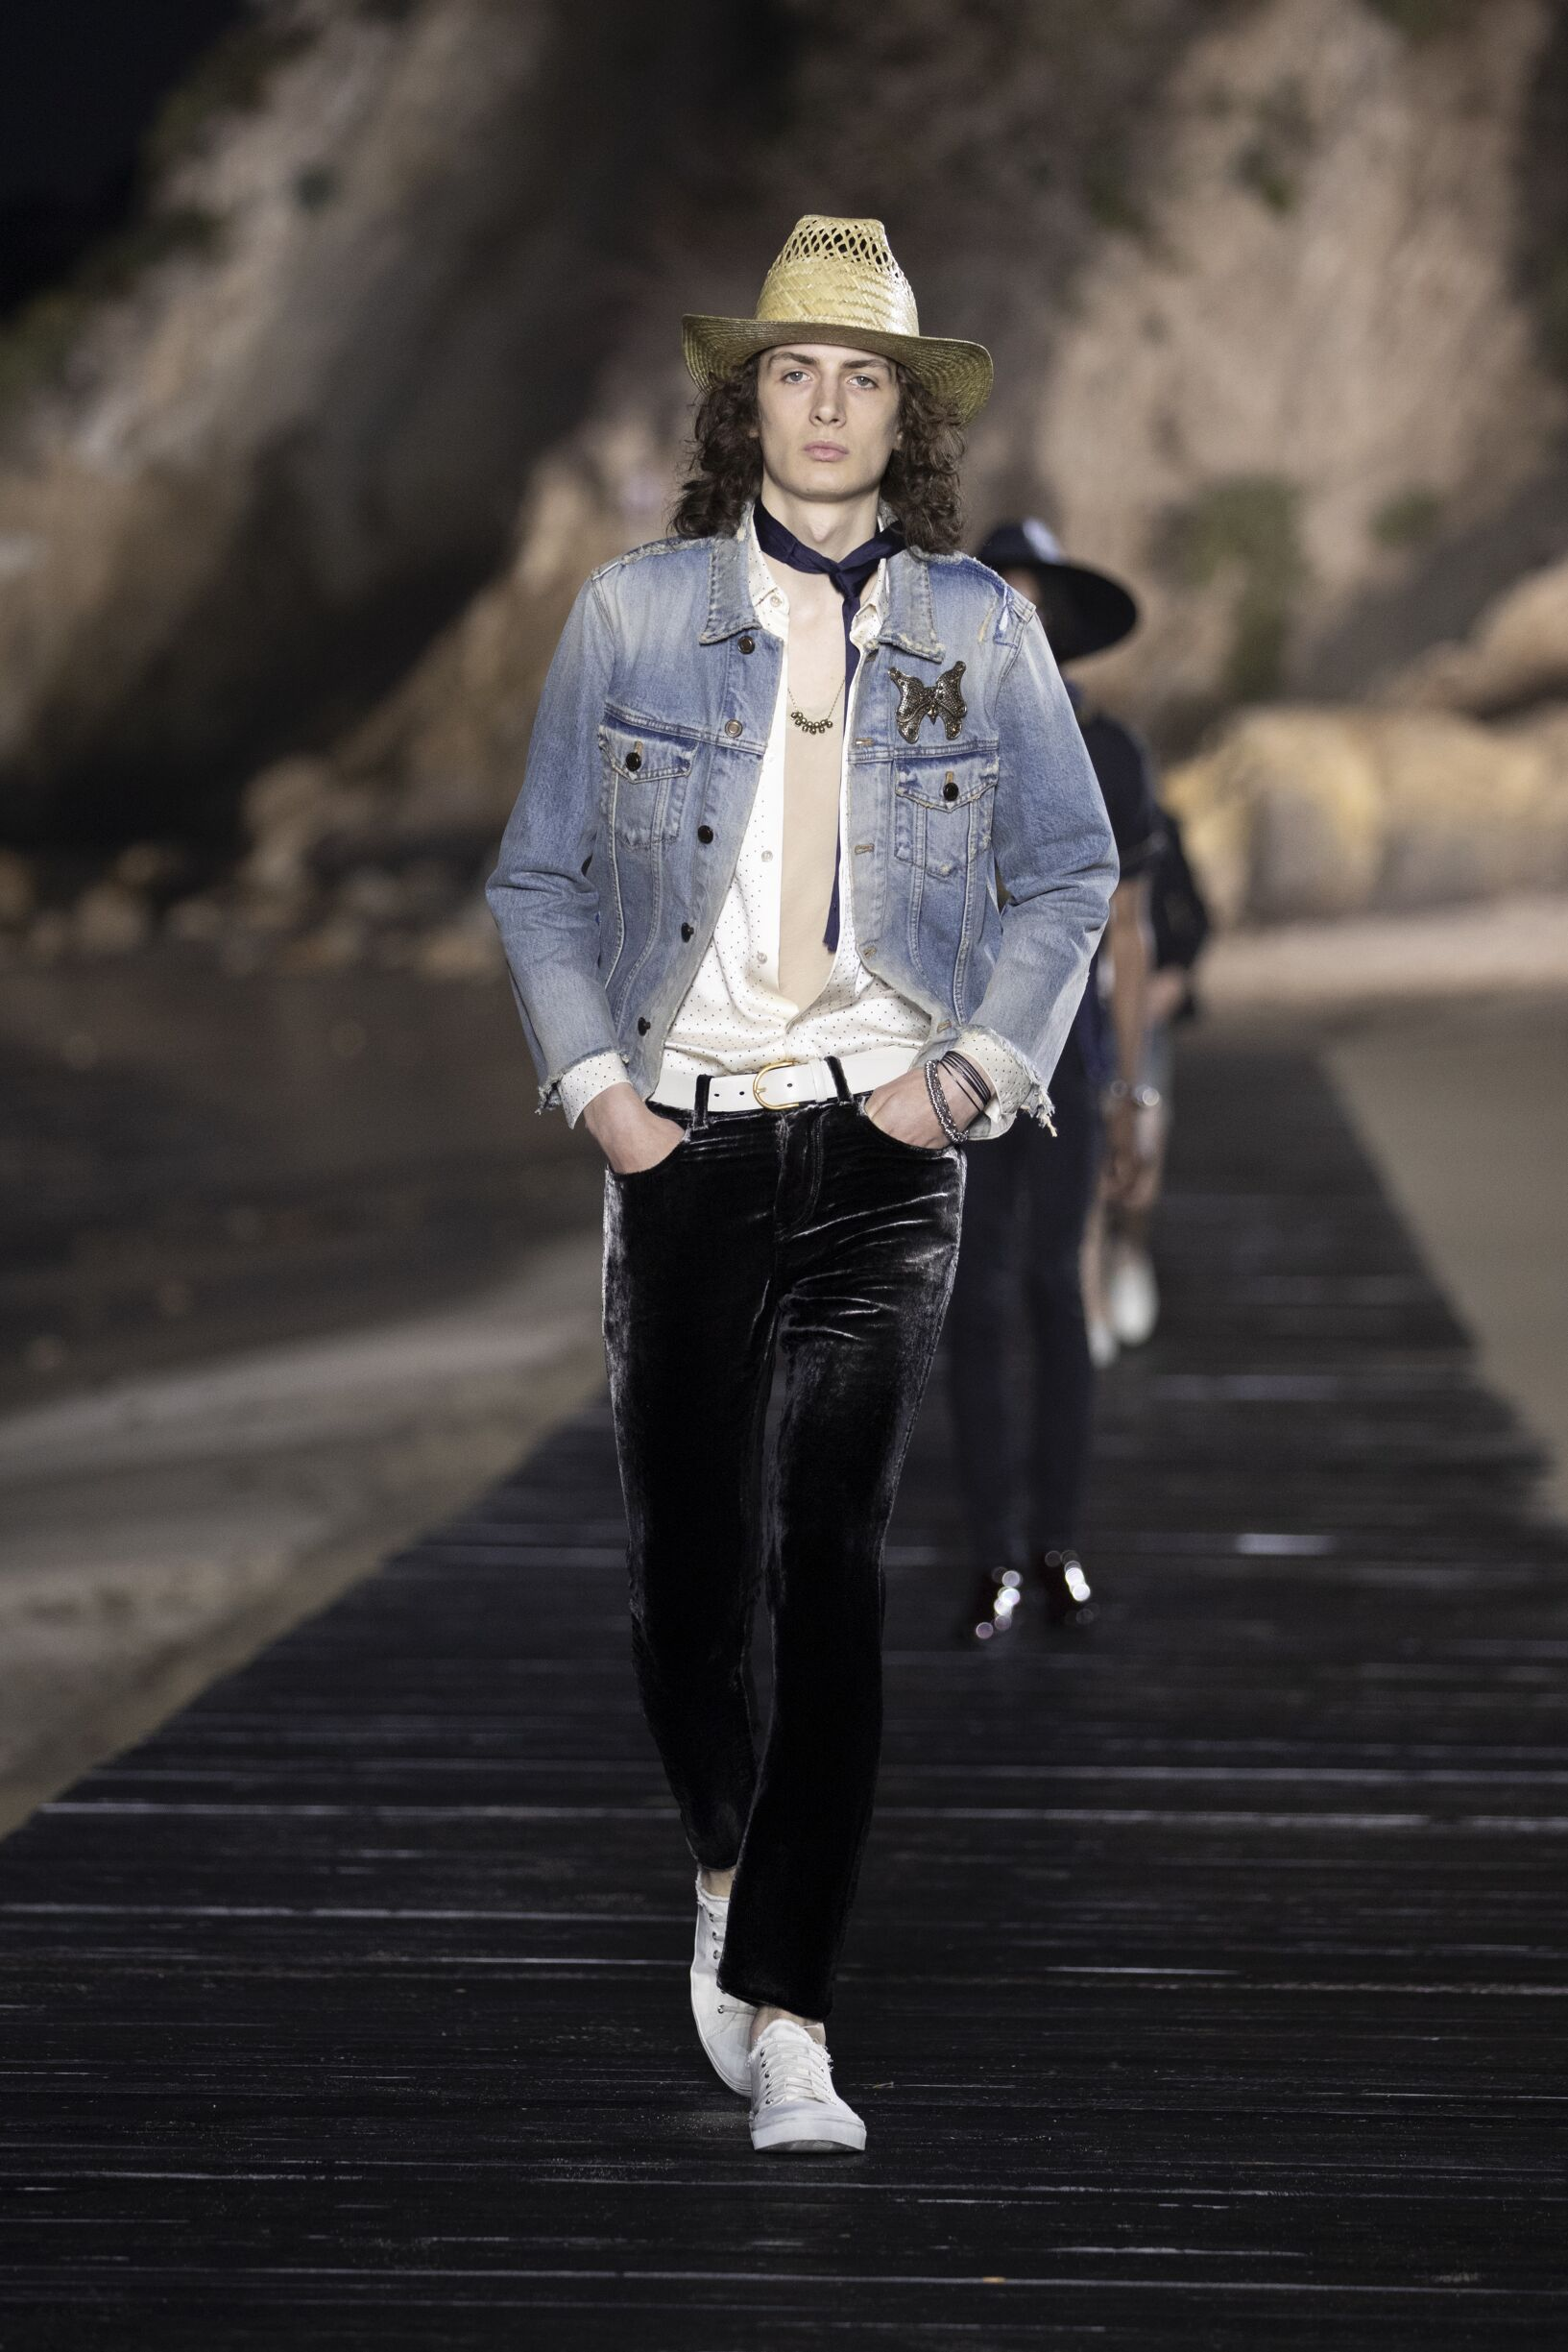 2020 Catwalk Saint Laurent Man Fashion Show Summer